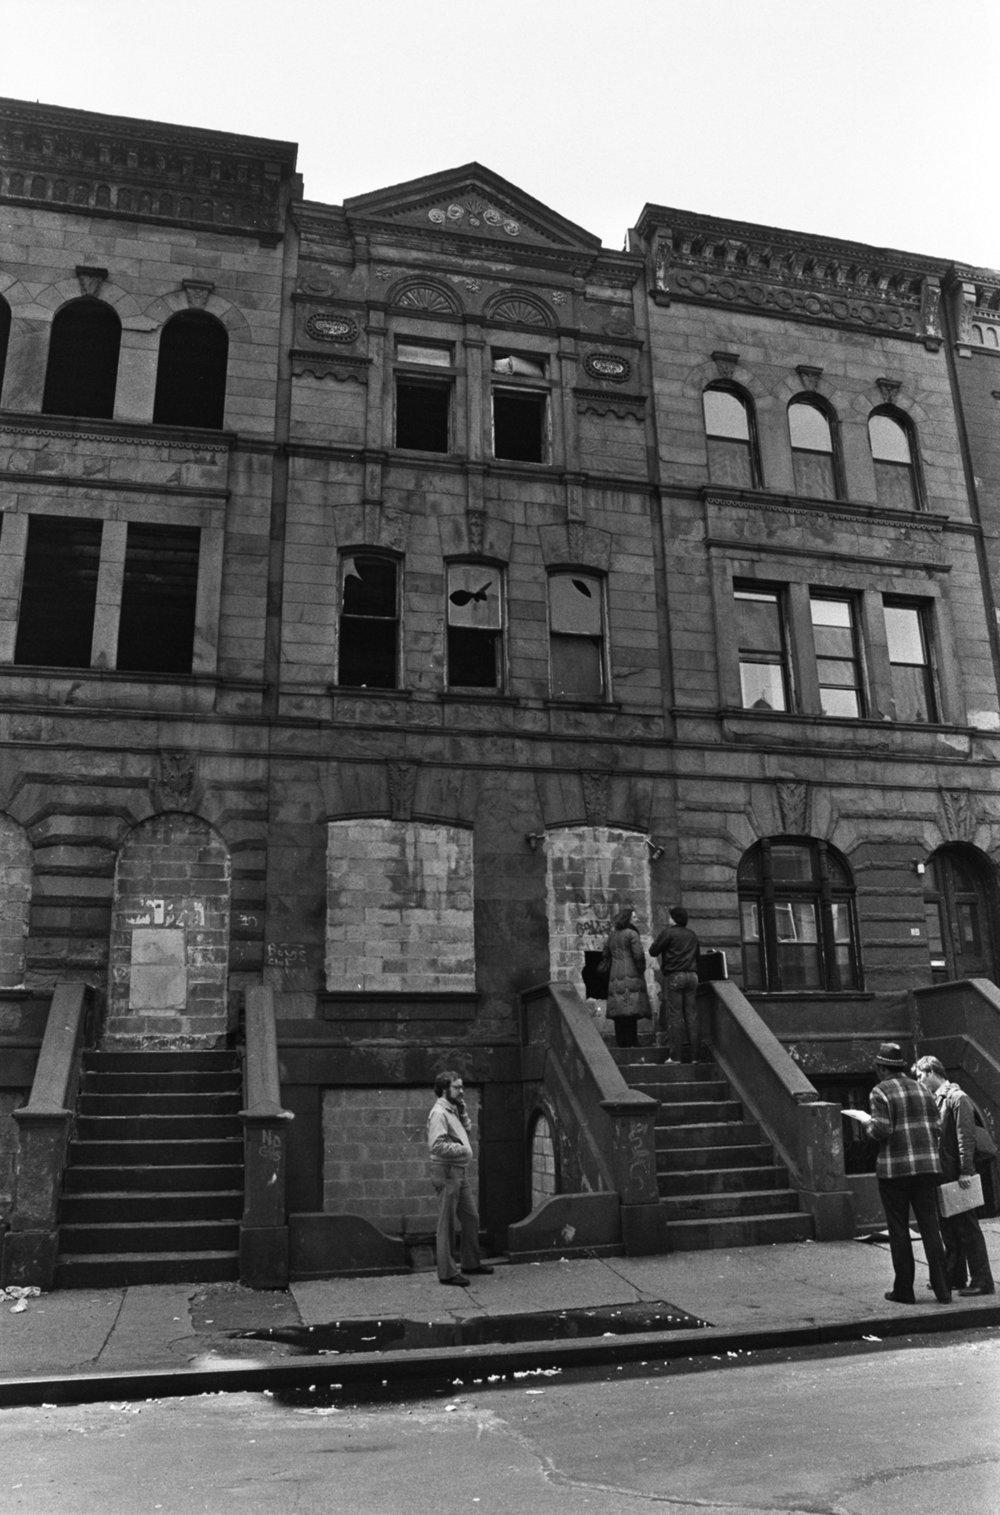 Building sales, Manhattan, April 1983. Photograph by Leonard Boykin.